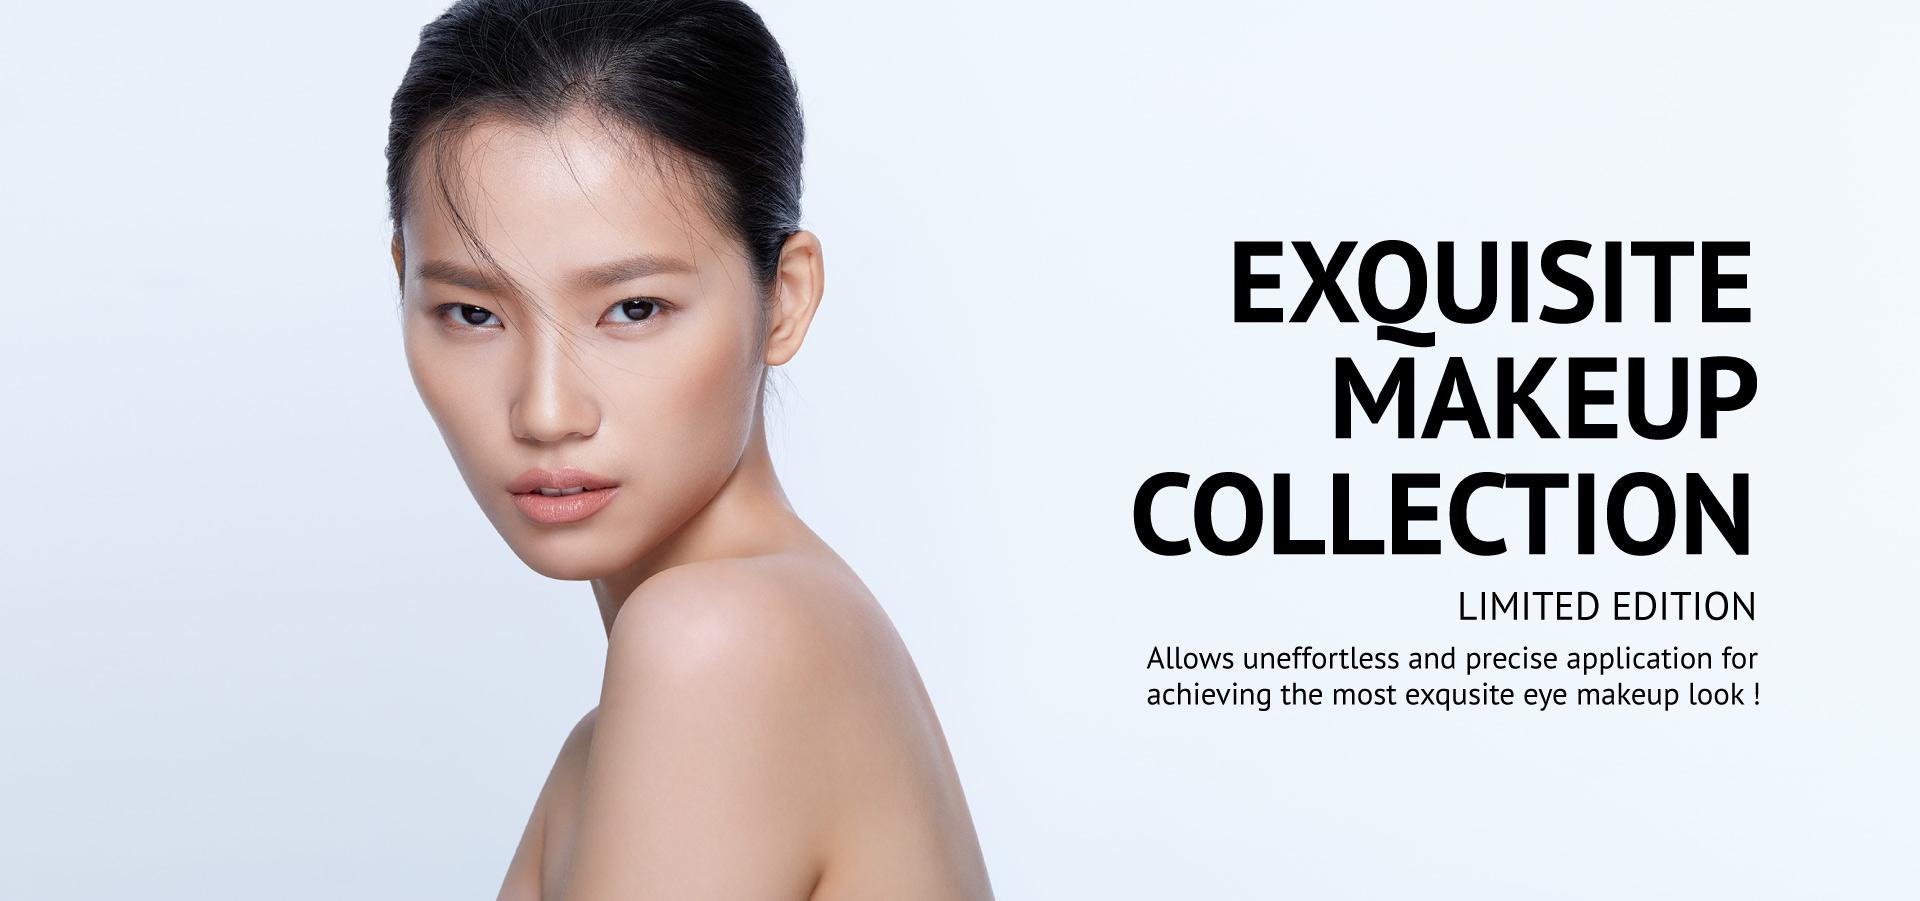 kaibeauty, eyeliner, mascara, eyeshadow, brush, lip, shipping, makeup, 刷具, 小凱